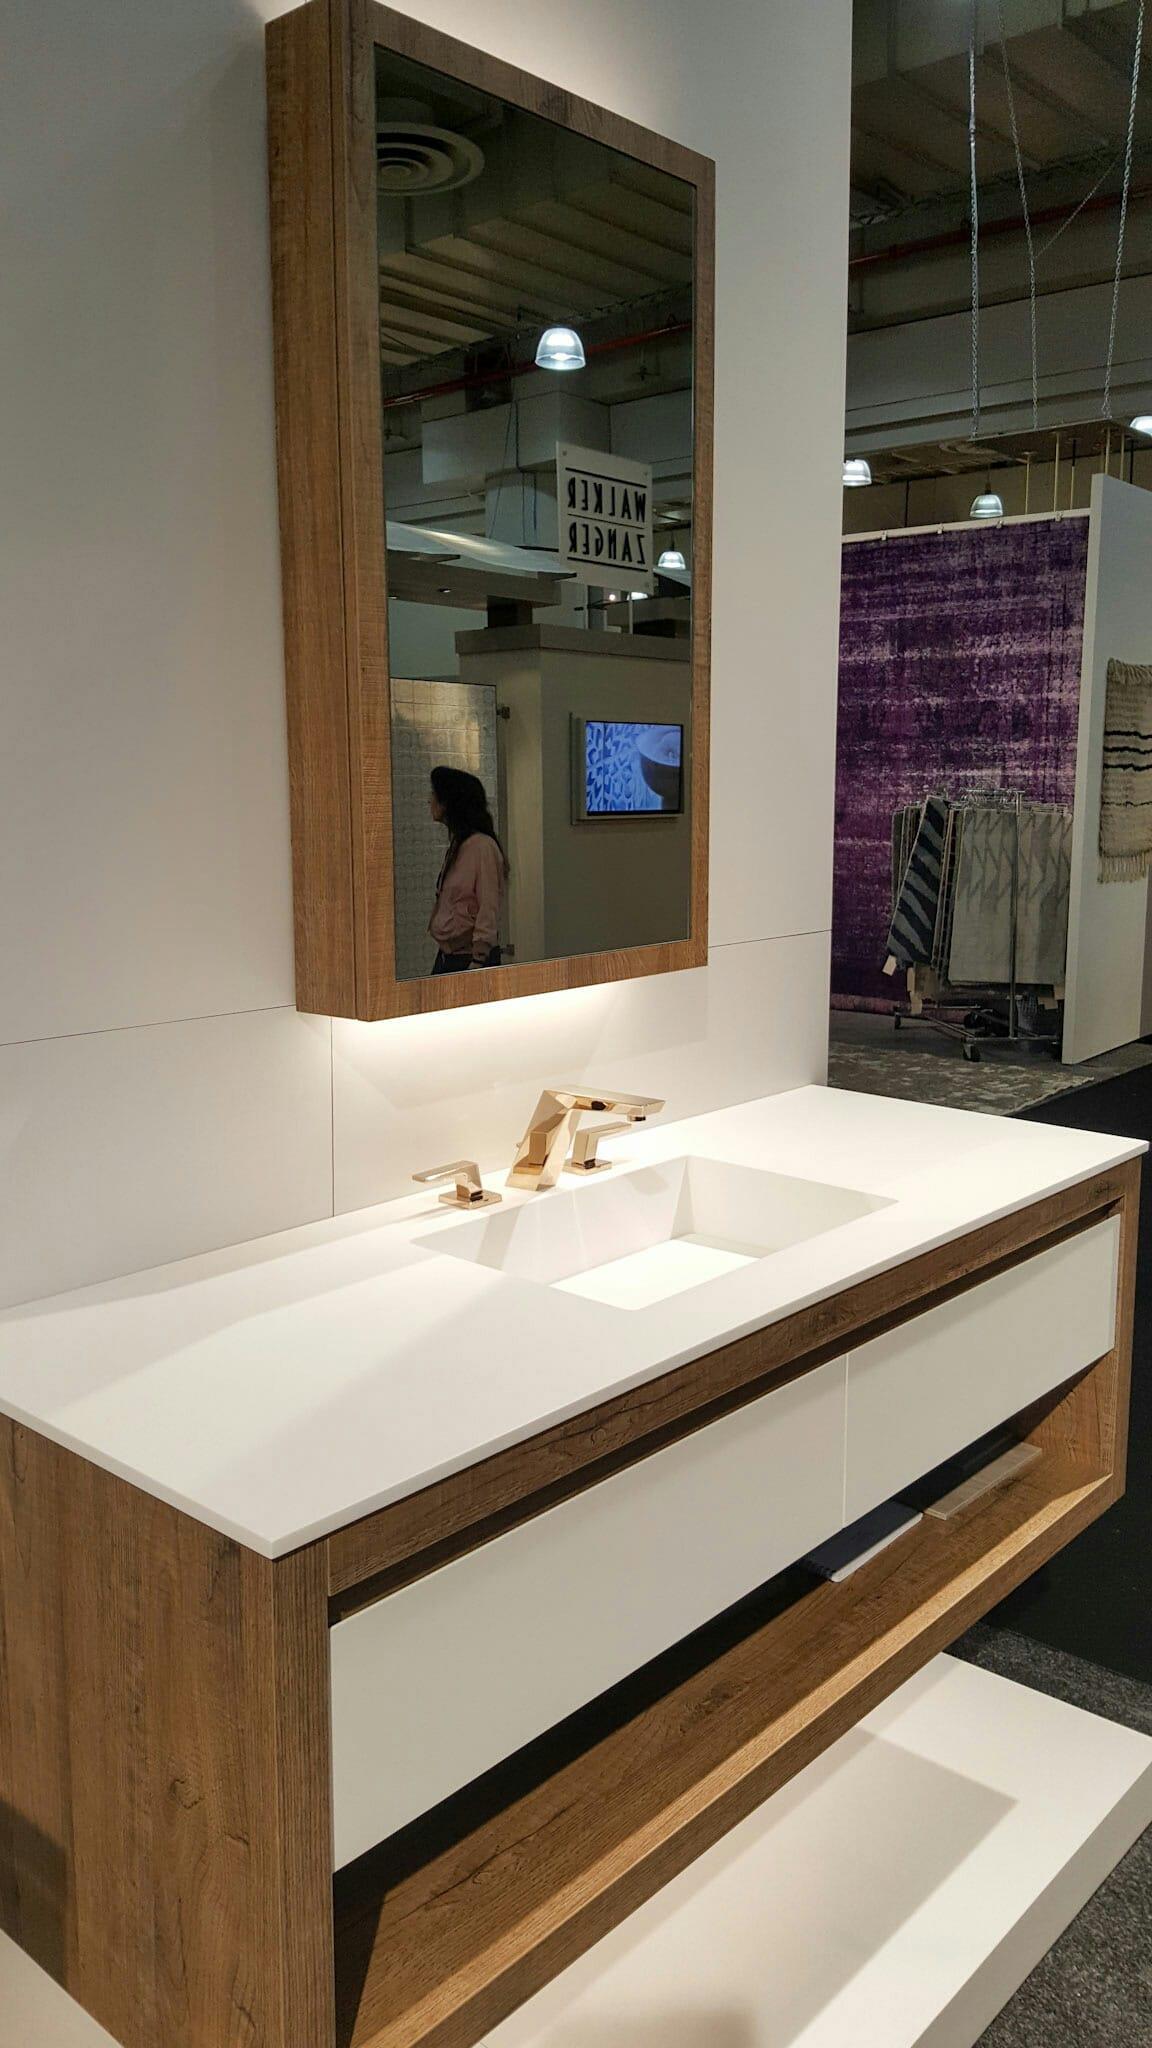 Contemporary Bathroom Furniture Fixtures Appliances